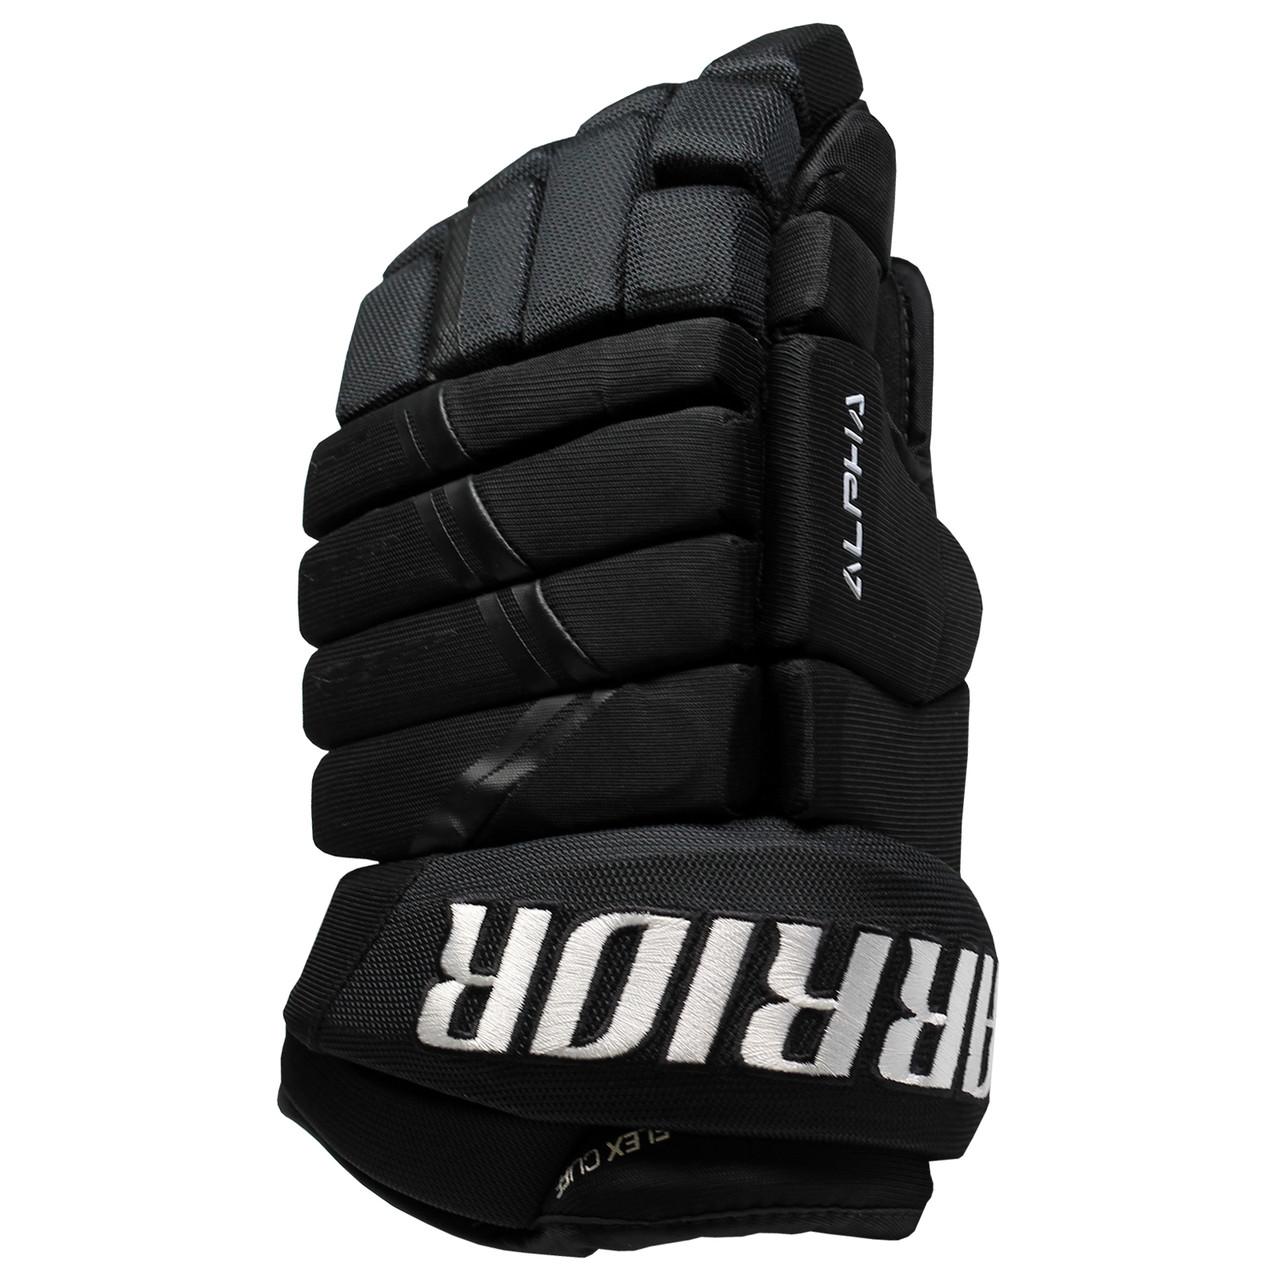 Warrior Alpha Force Pro DX 9 SMU Junior Hockey Gloves - Various Colors